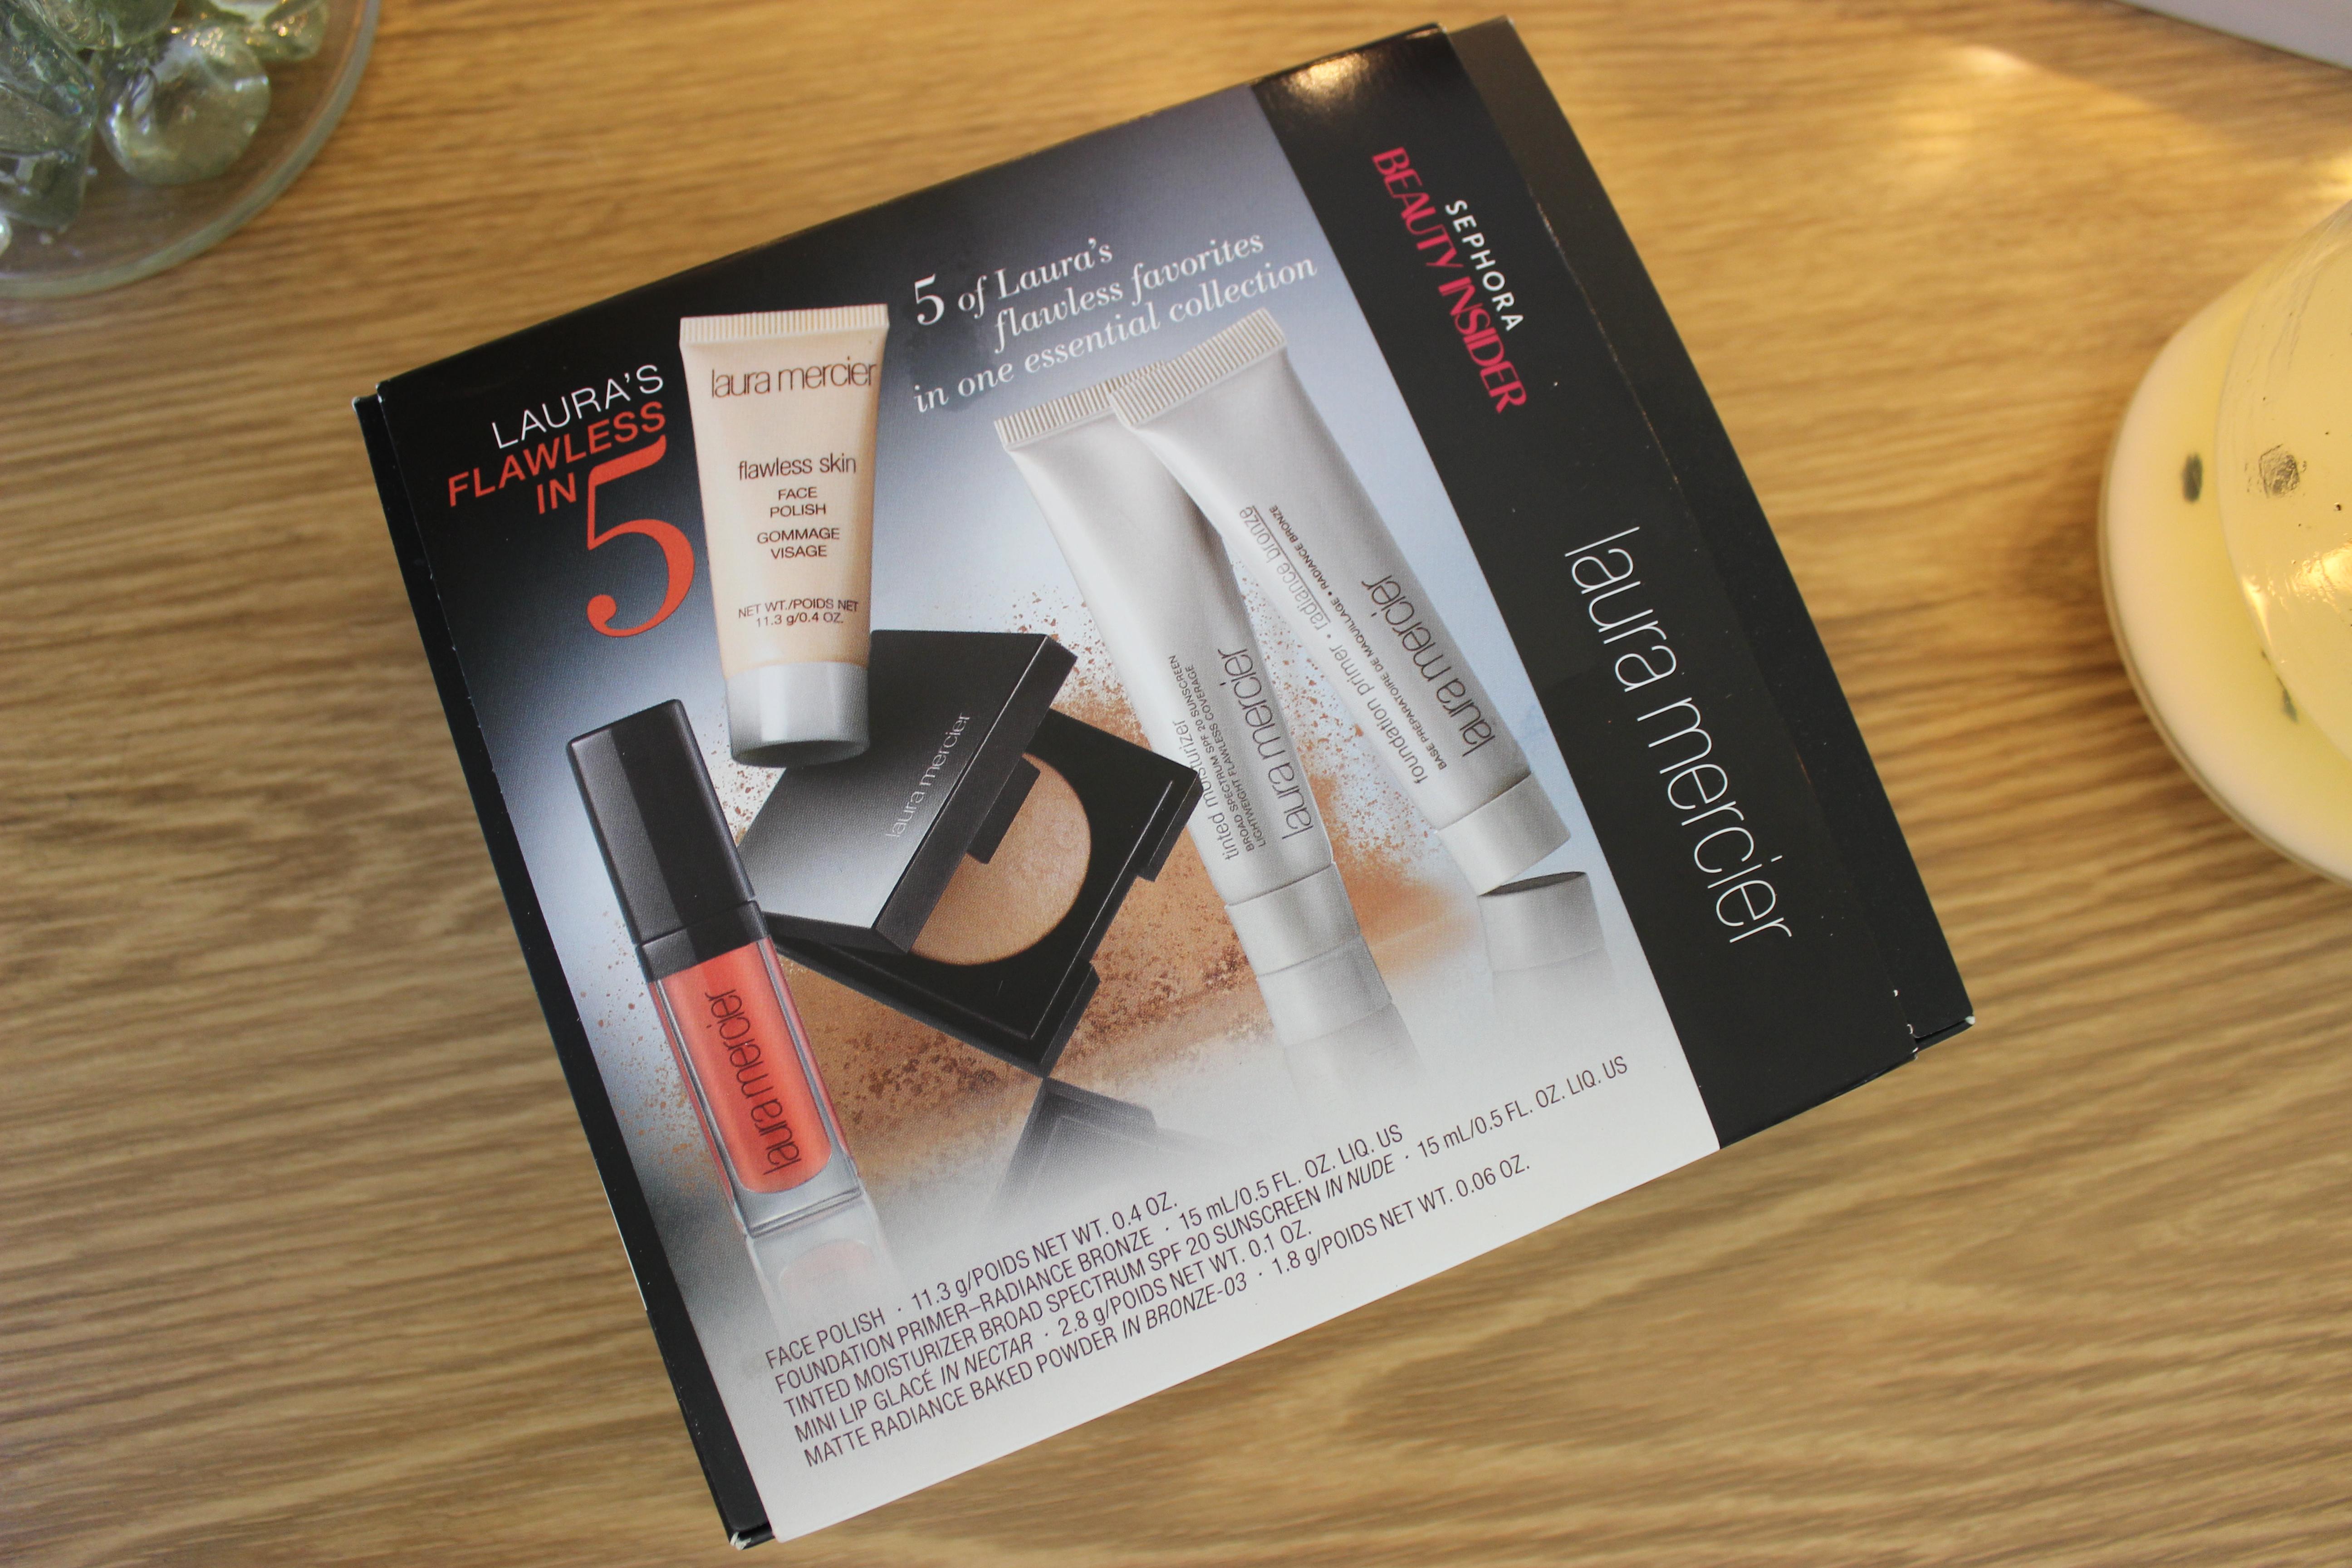 Translucent Loose Setting Powder - Laura Mercier | Sephora